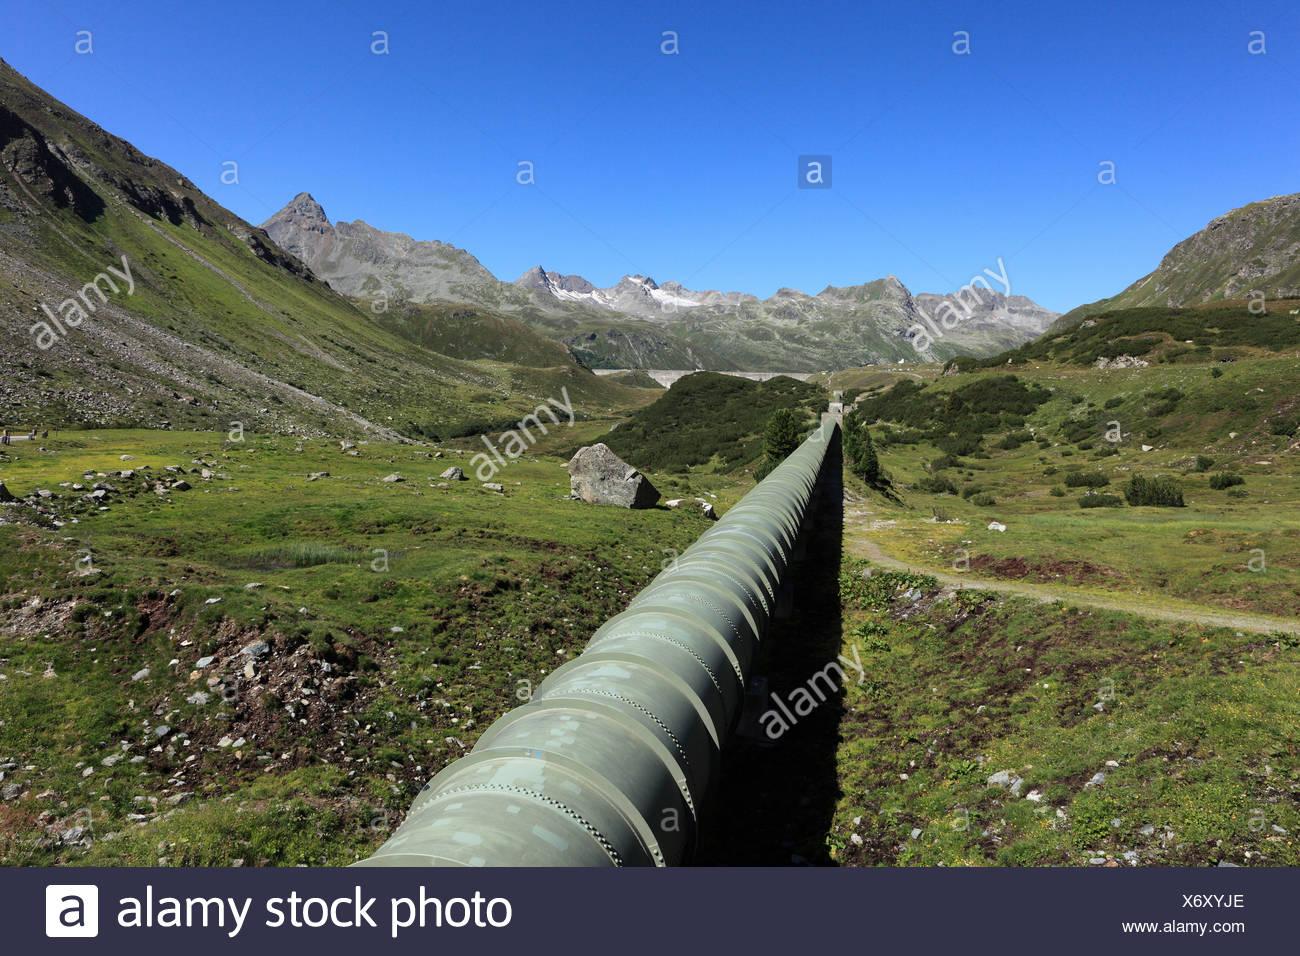 Dam and water pipeline from Lake Silvretta, Bielerhoehe, Grossvermunt, Montafon, Silvretta Group, Vorarlberg, Austria, Europe - Stock Image